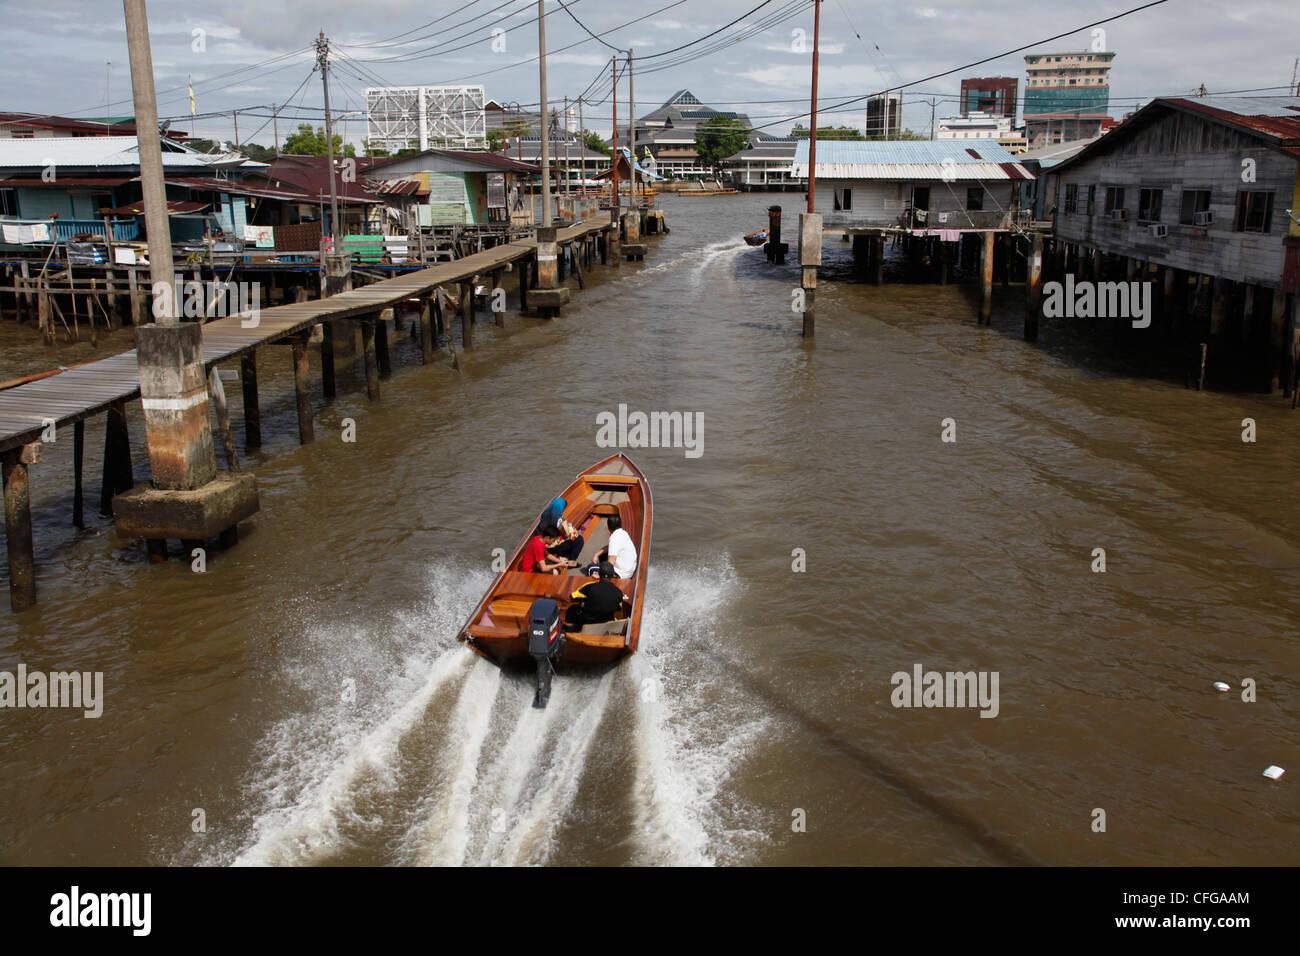 Speedboats and river taxis in water village in Bandar Seri Begawan, Brunei  - Stock Image